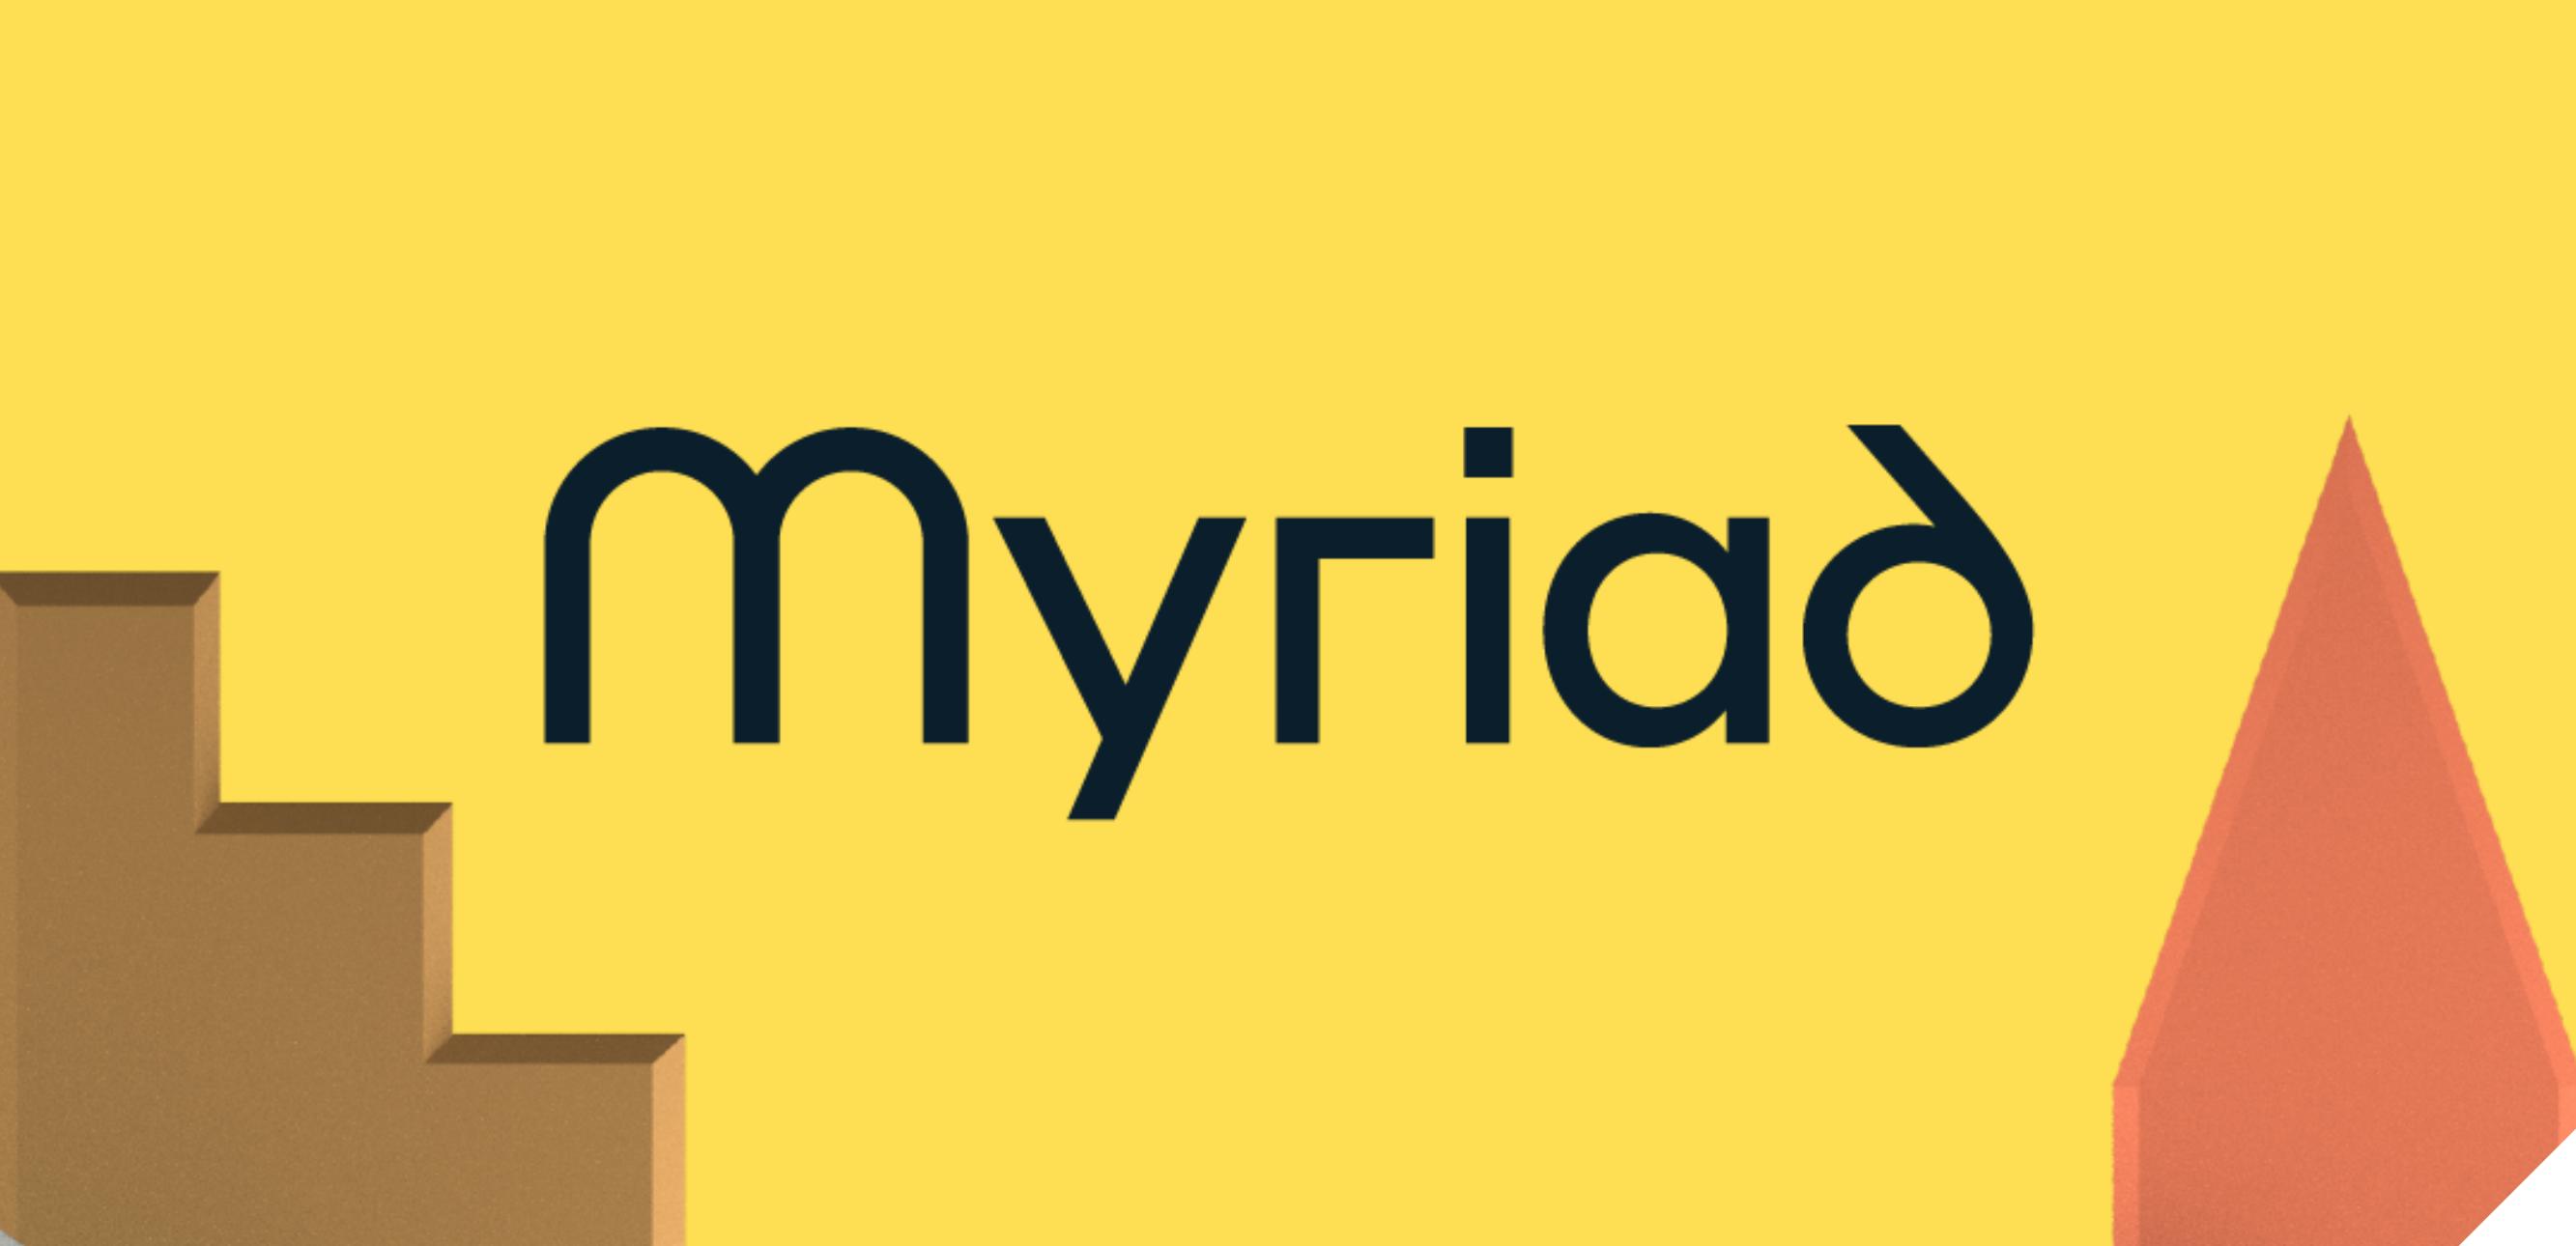 Myriad: Awakening Gifts and Callings